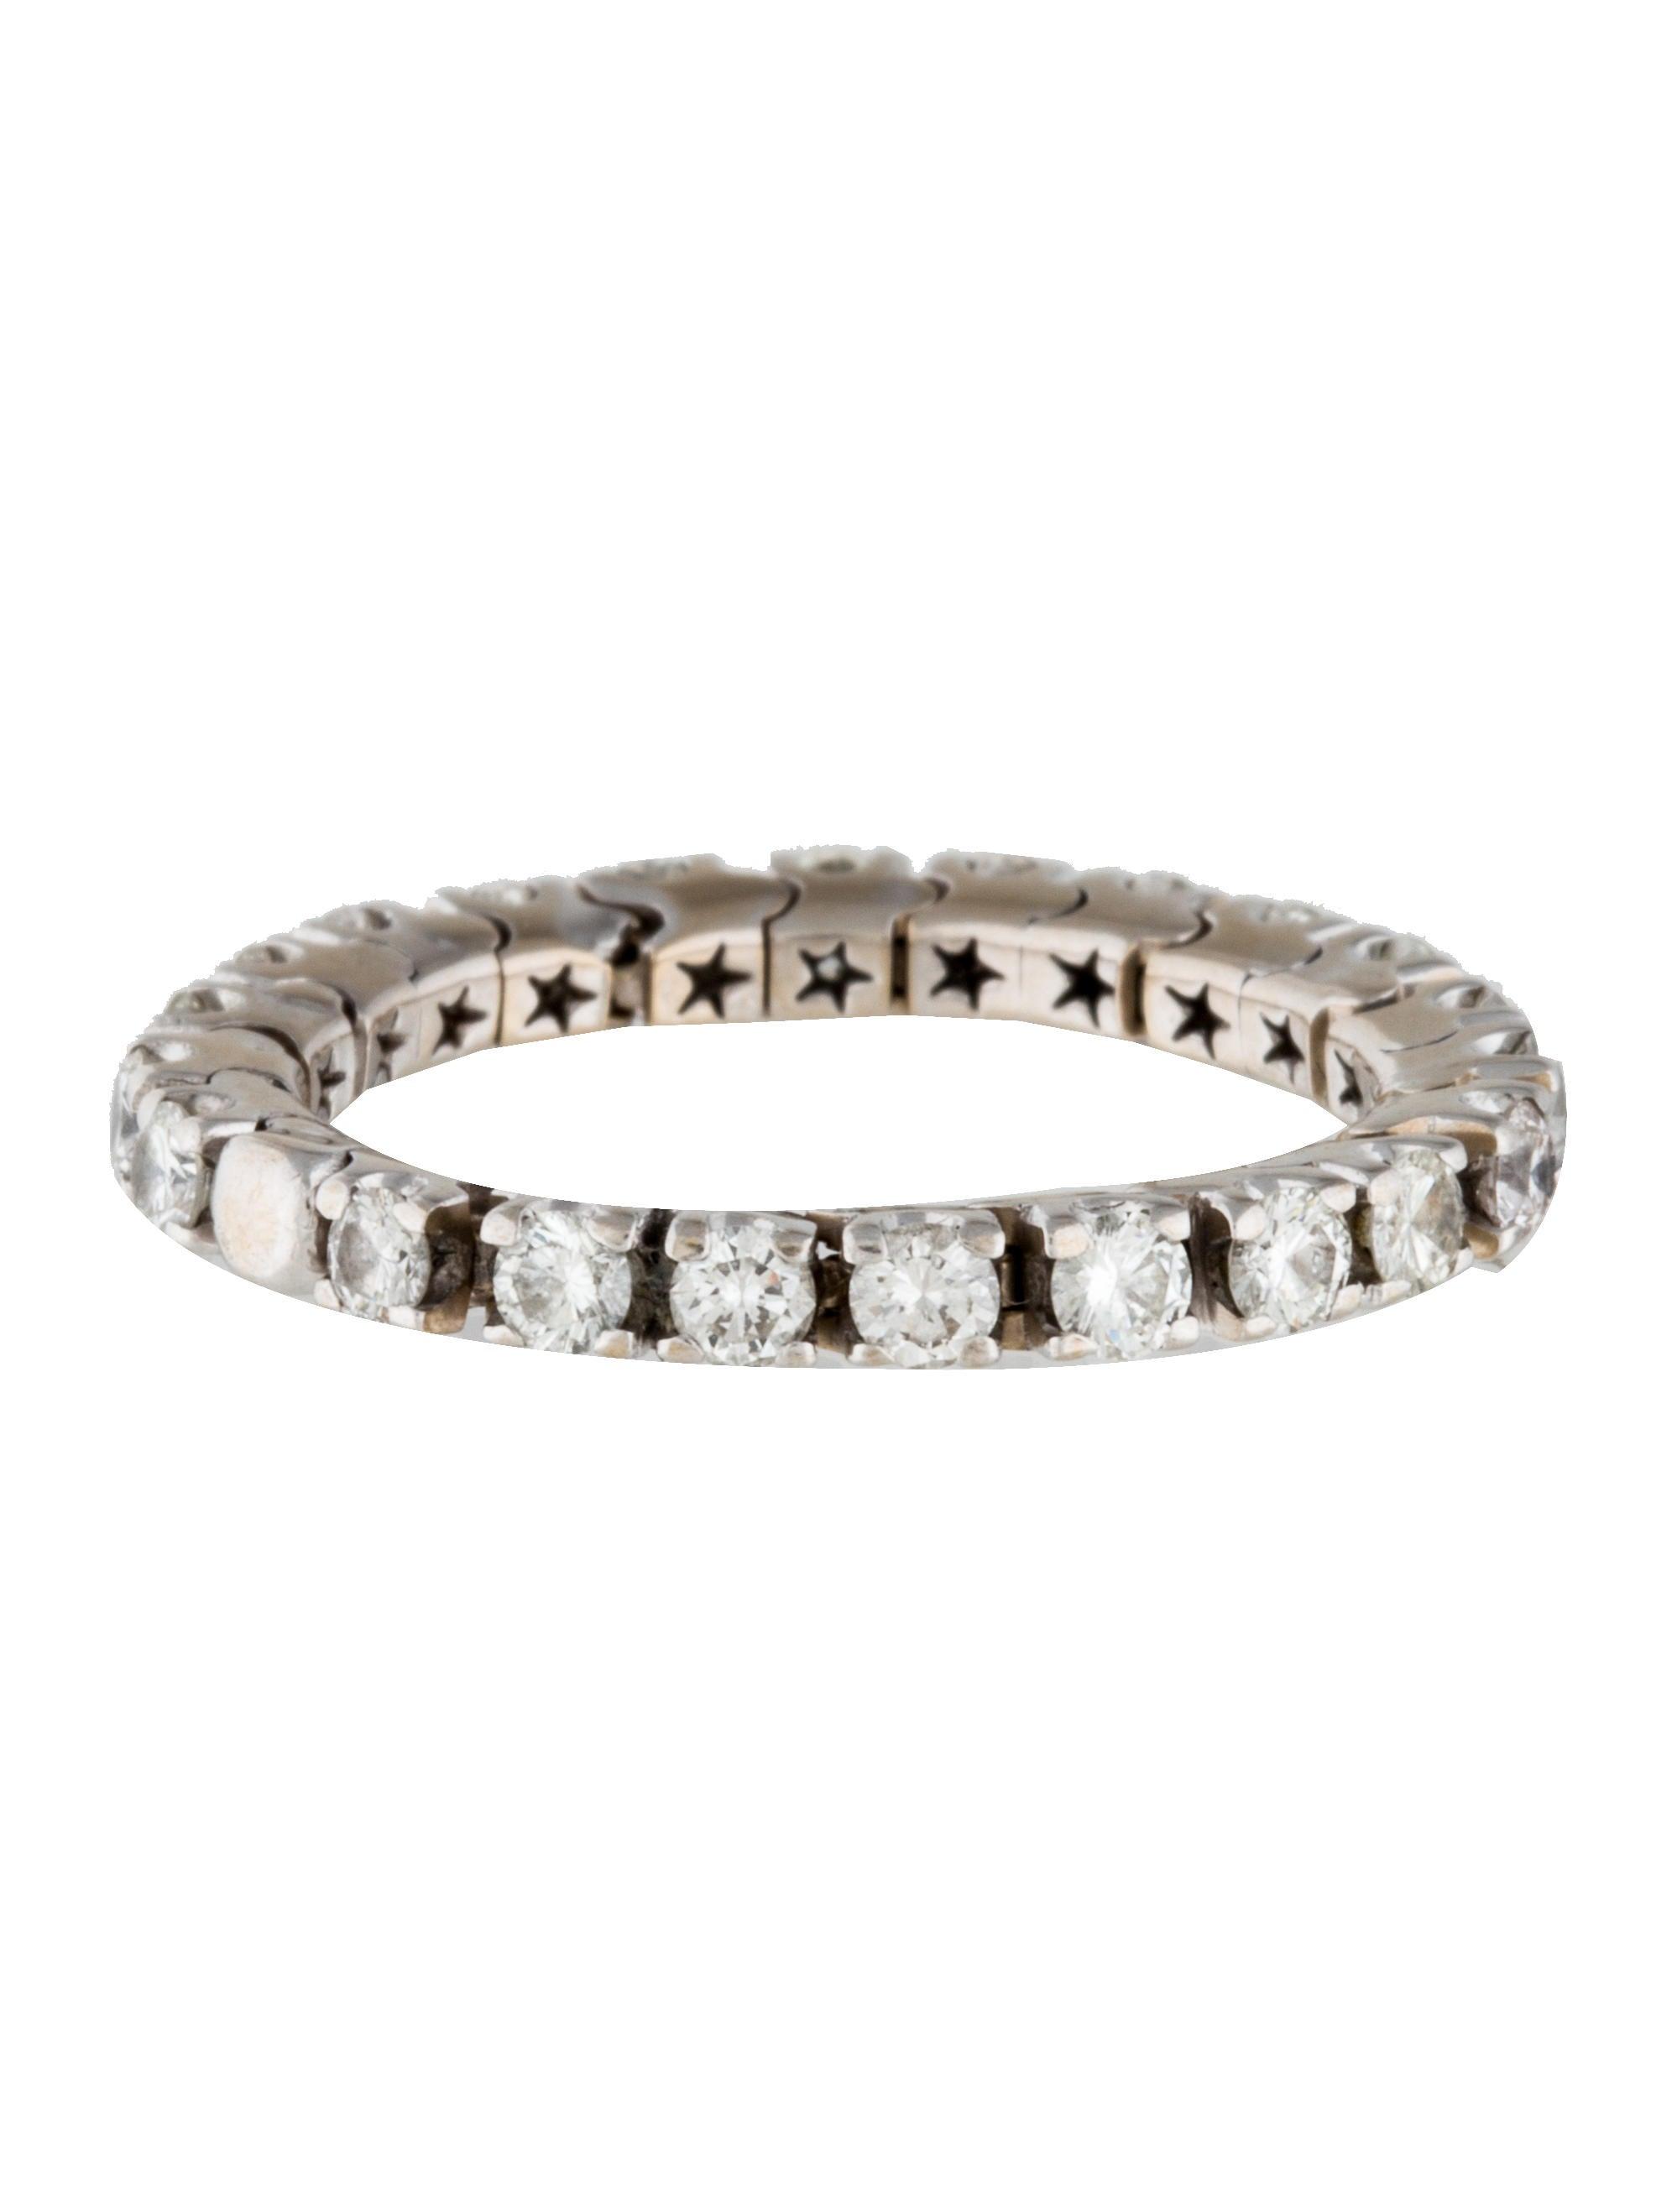 H.Stern Flexible Diamond Eternity Band - Rings - HST20234 | The ...